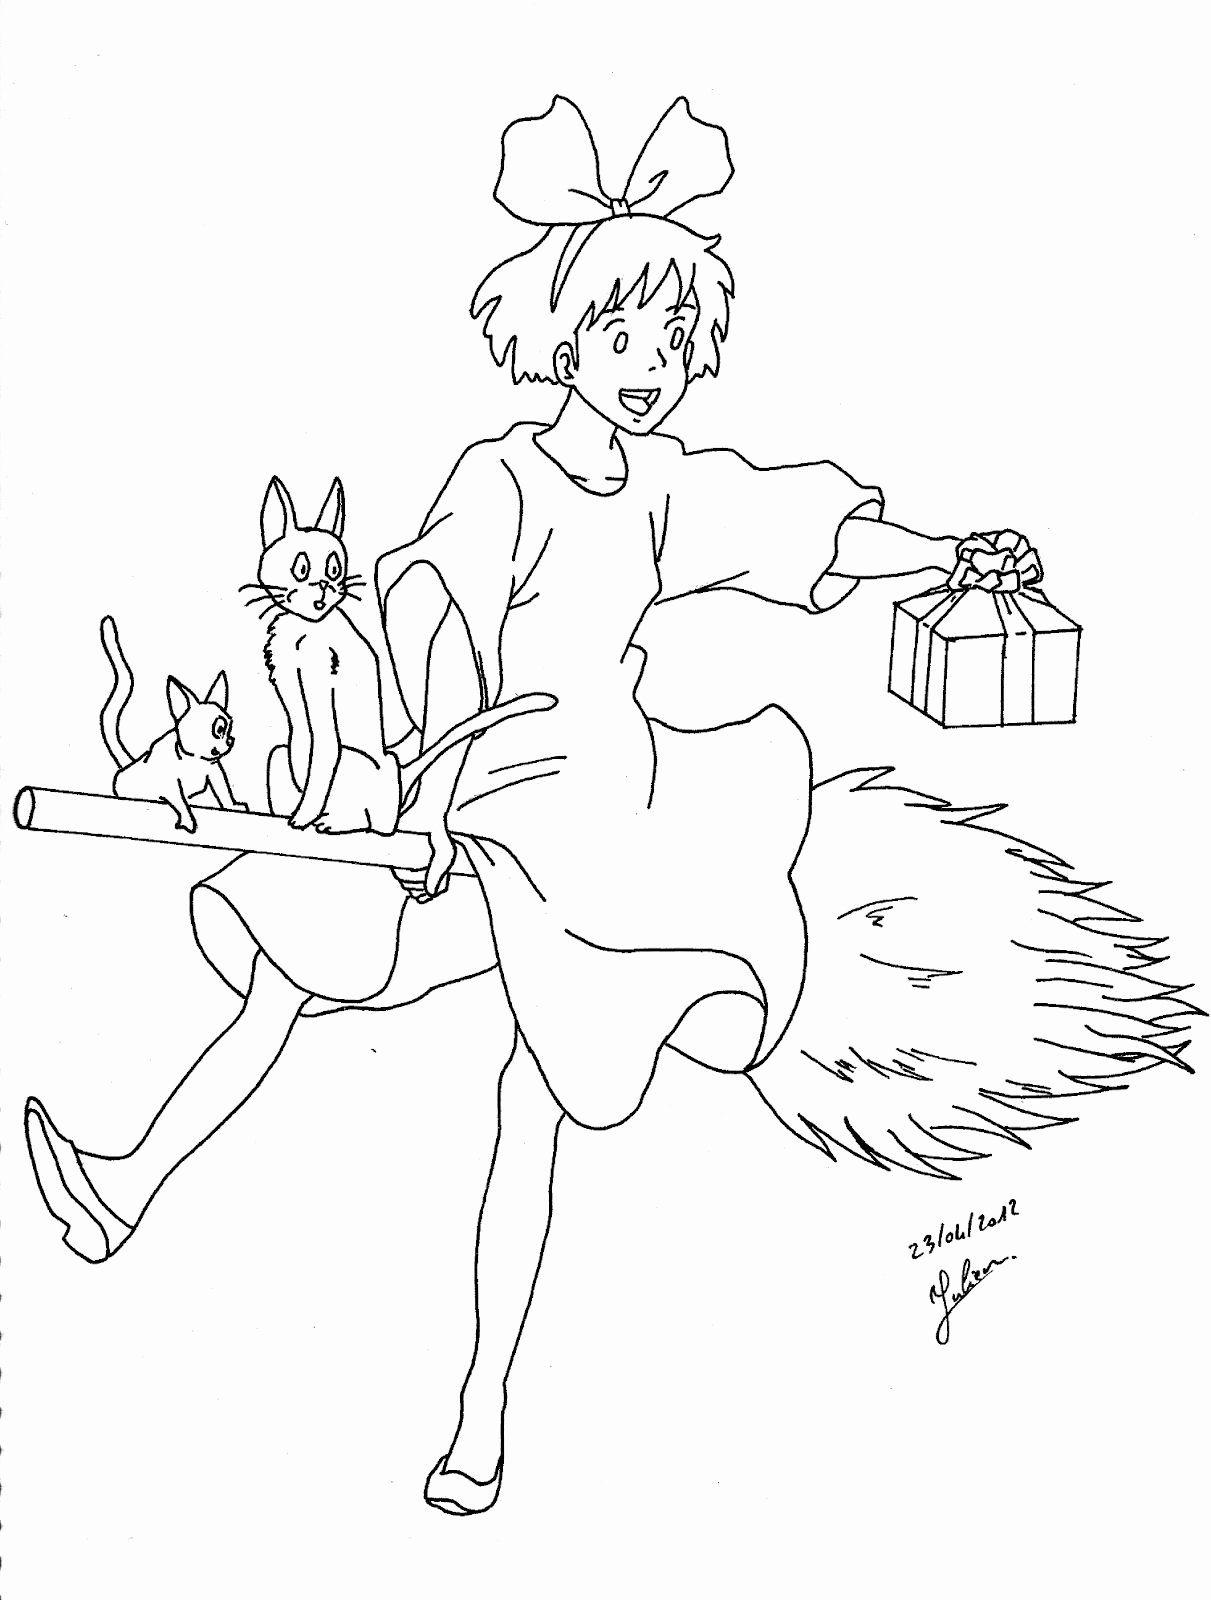 Studio Ghibli Coloring Book Beautiful Kiki La Petite Sorciere Sur Son Balai Ghibli Art Studio Ghibli Art Anime Crafts